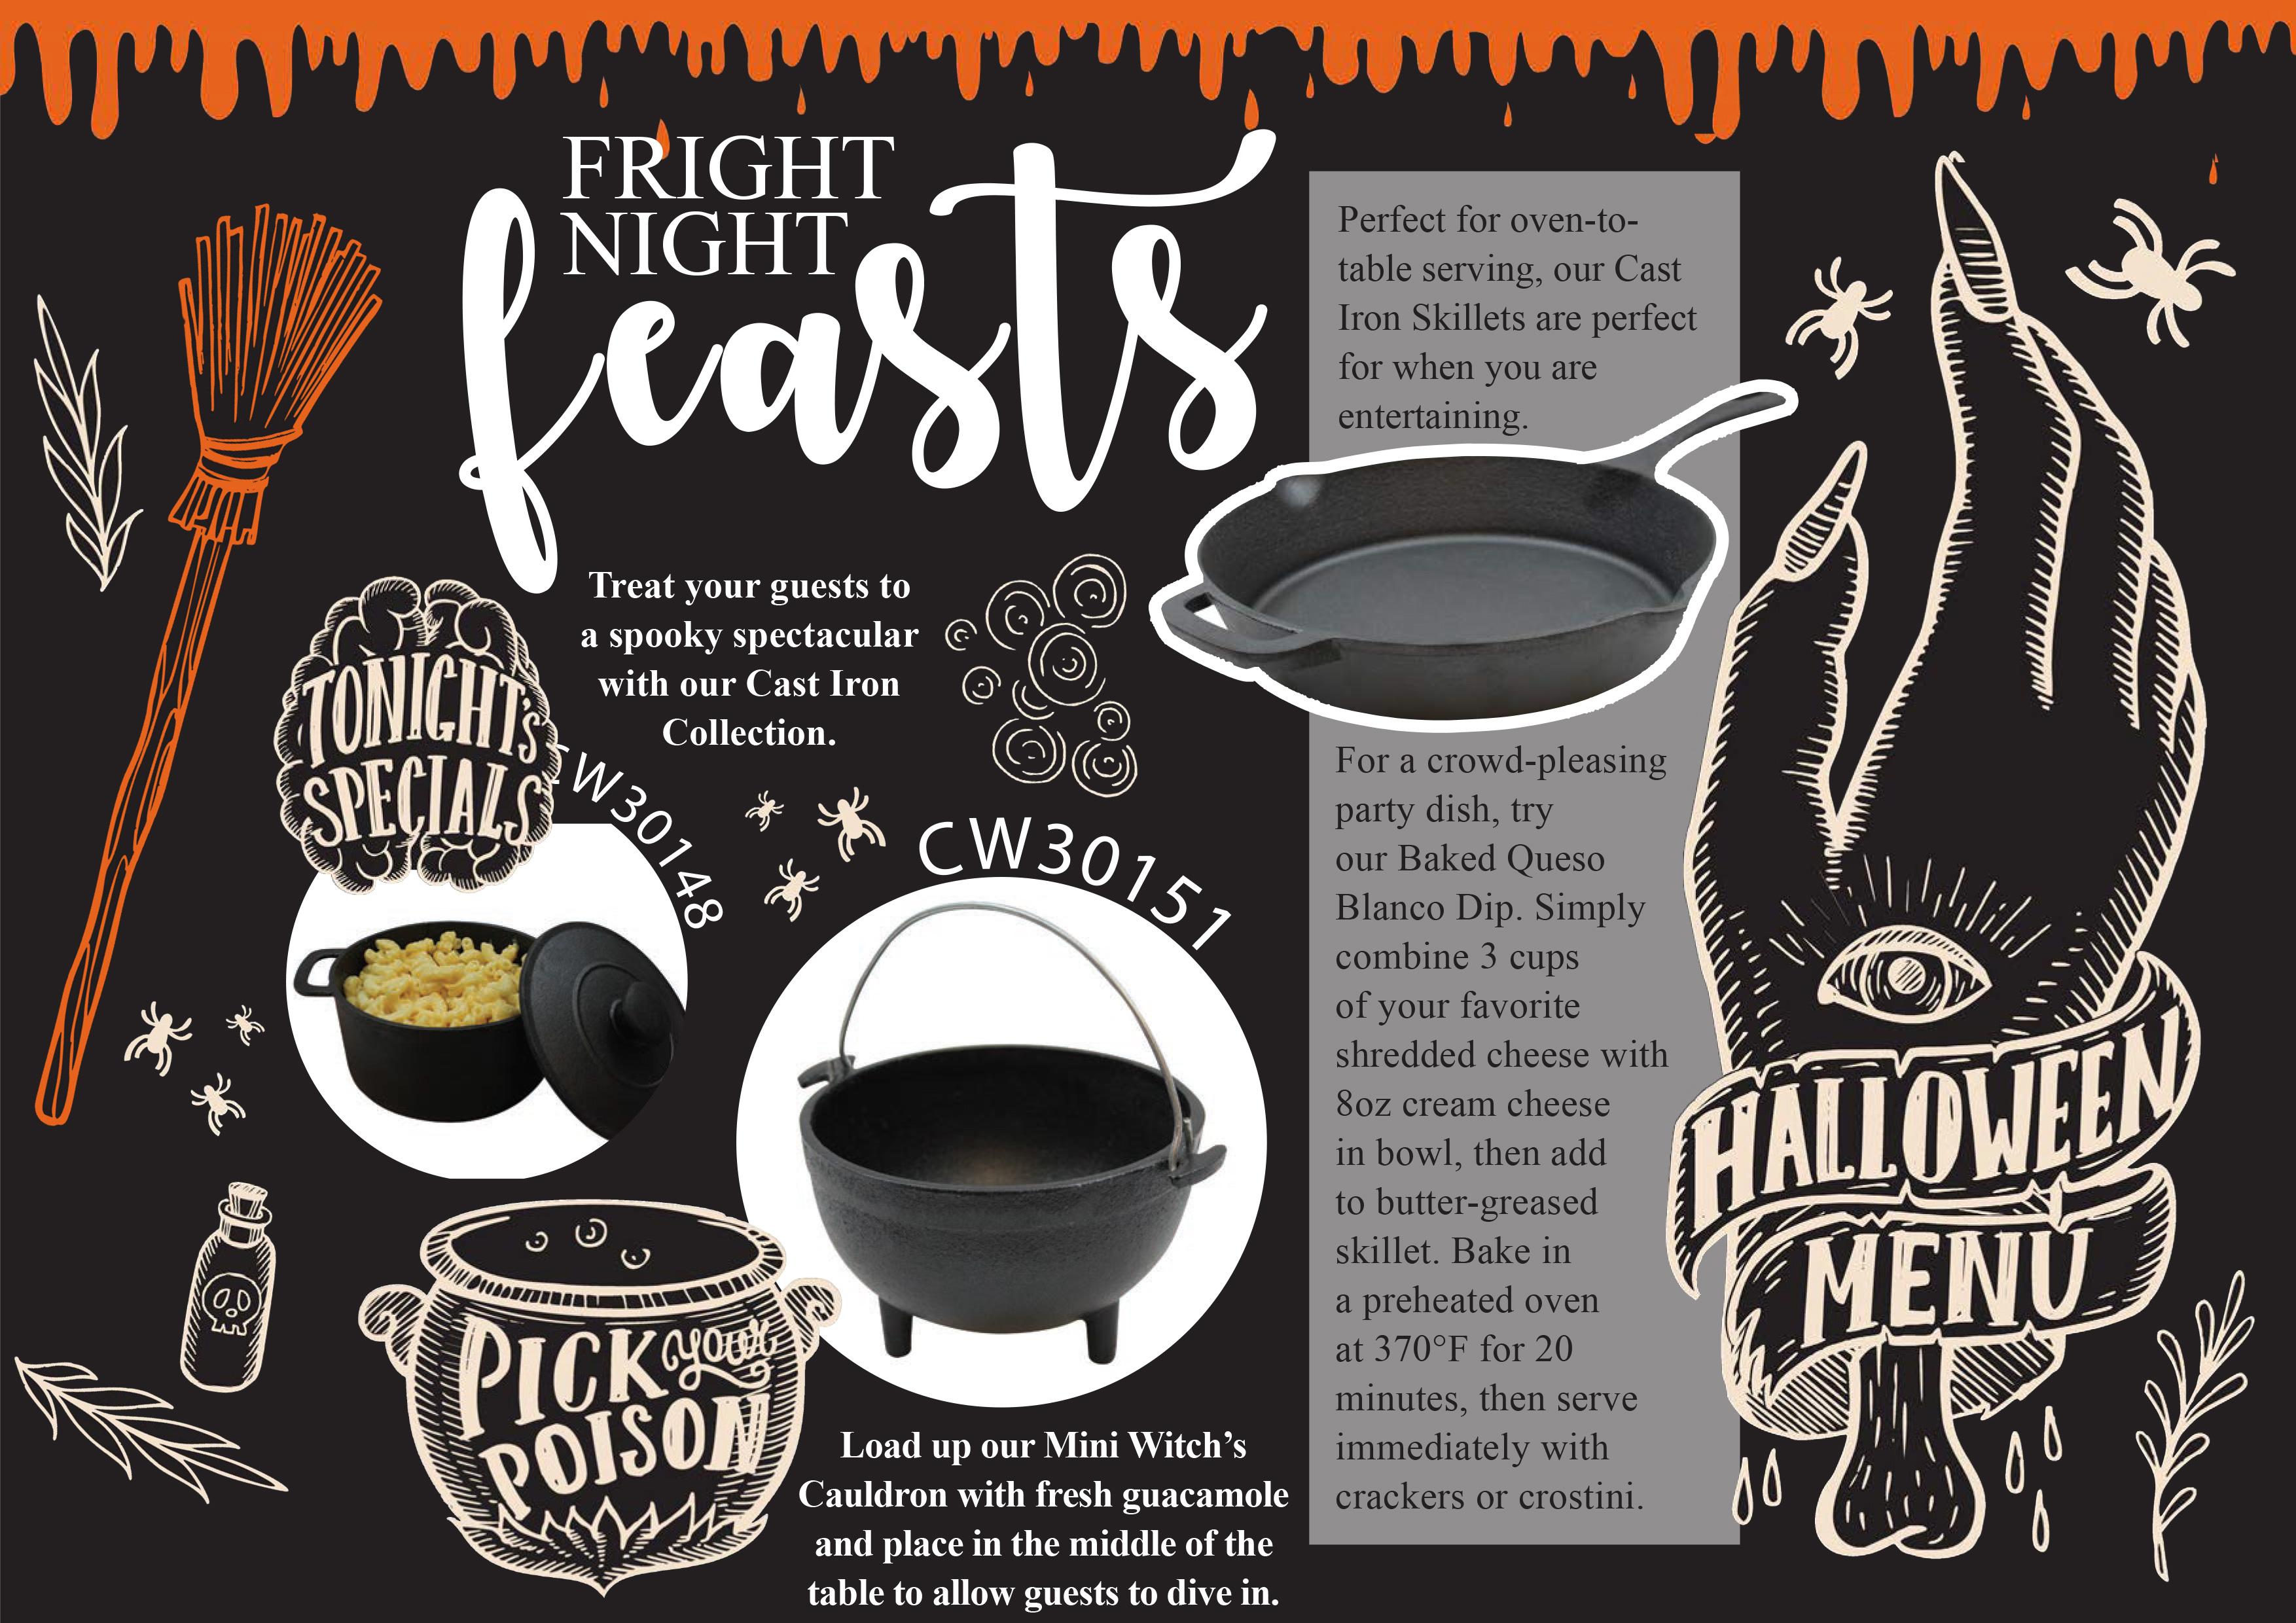 fright night feasts